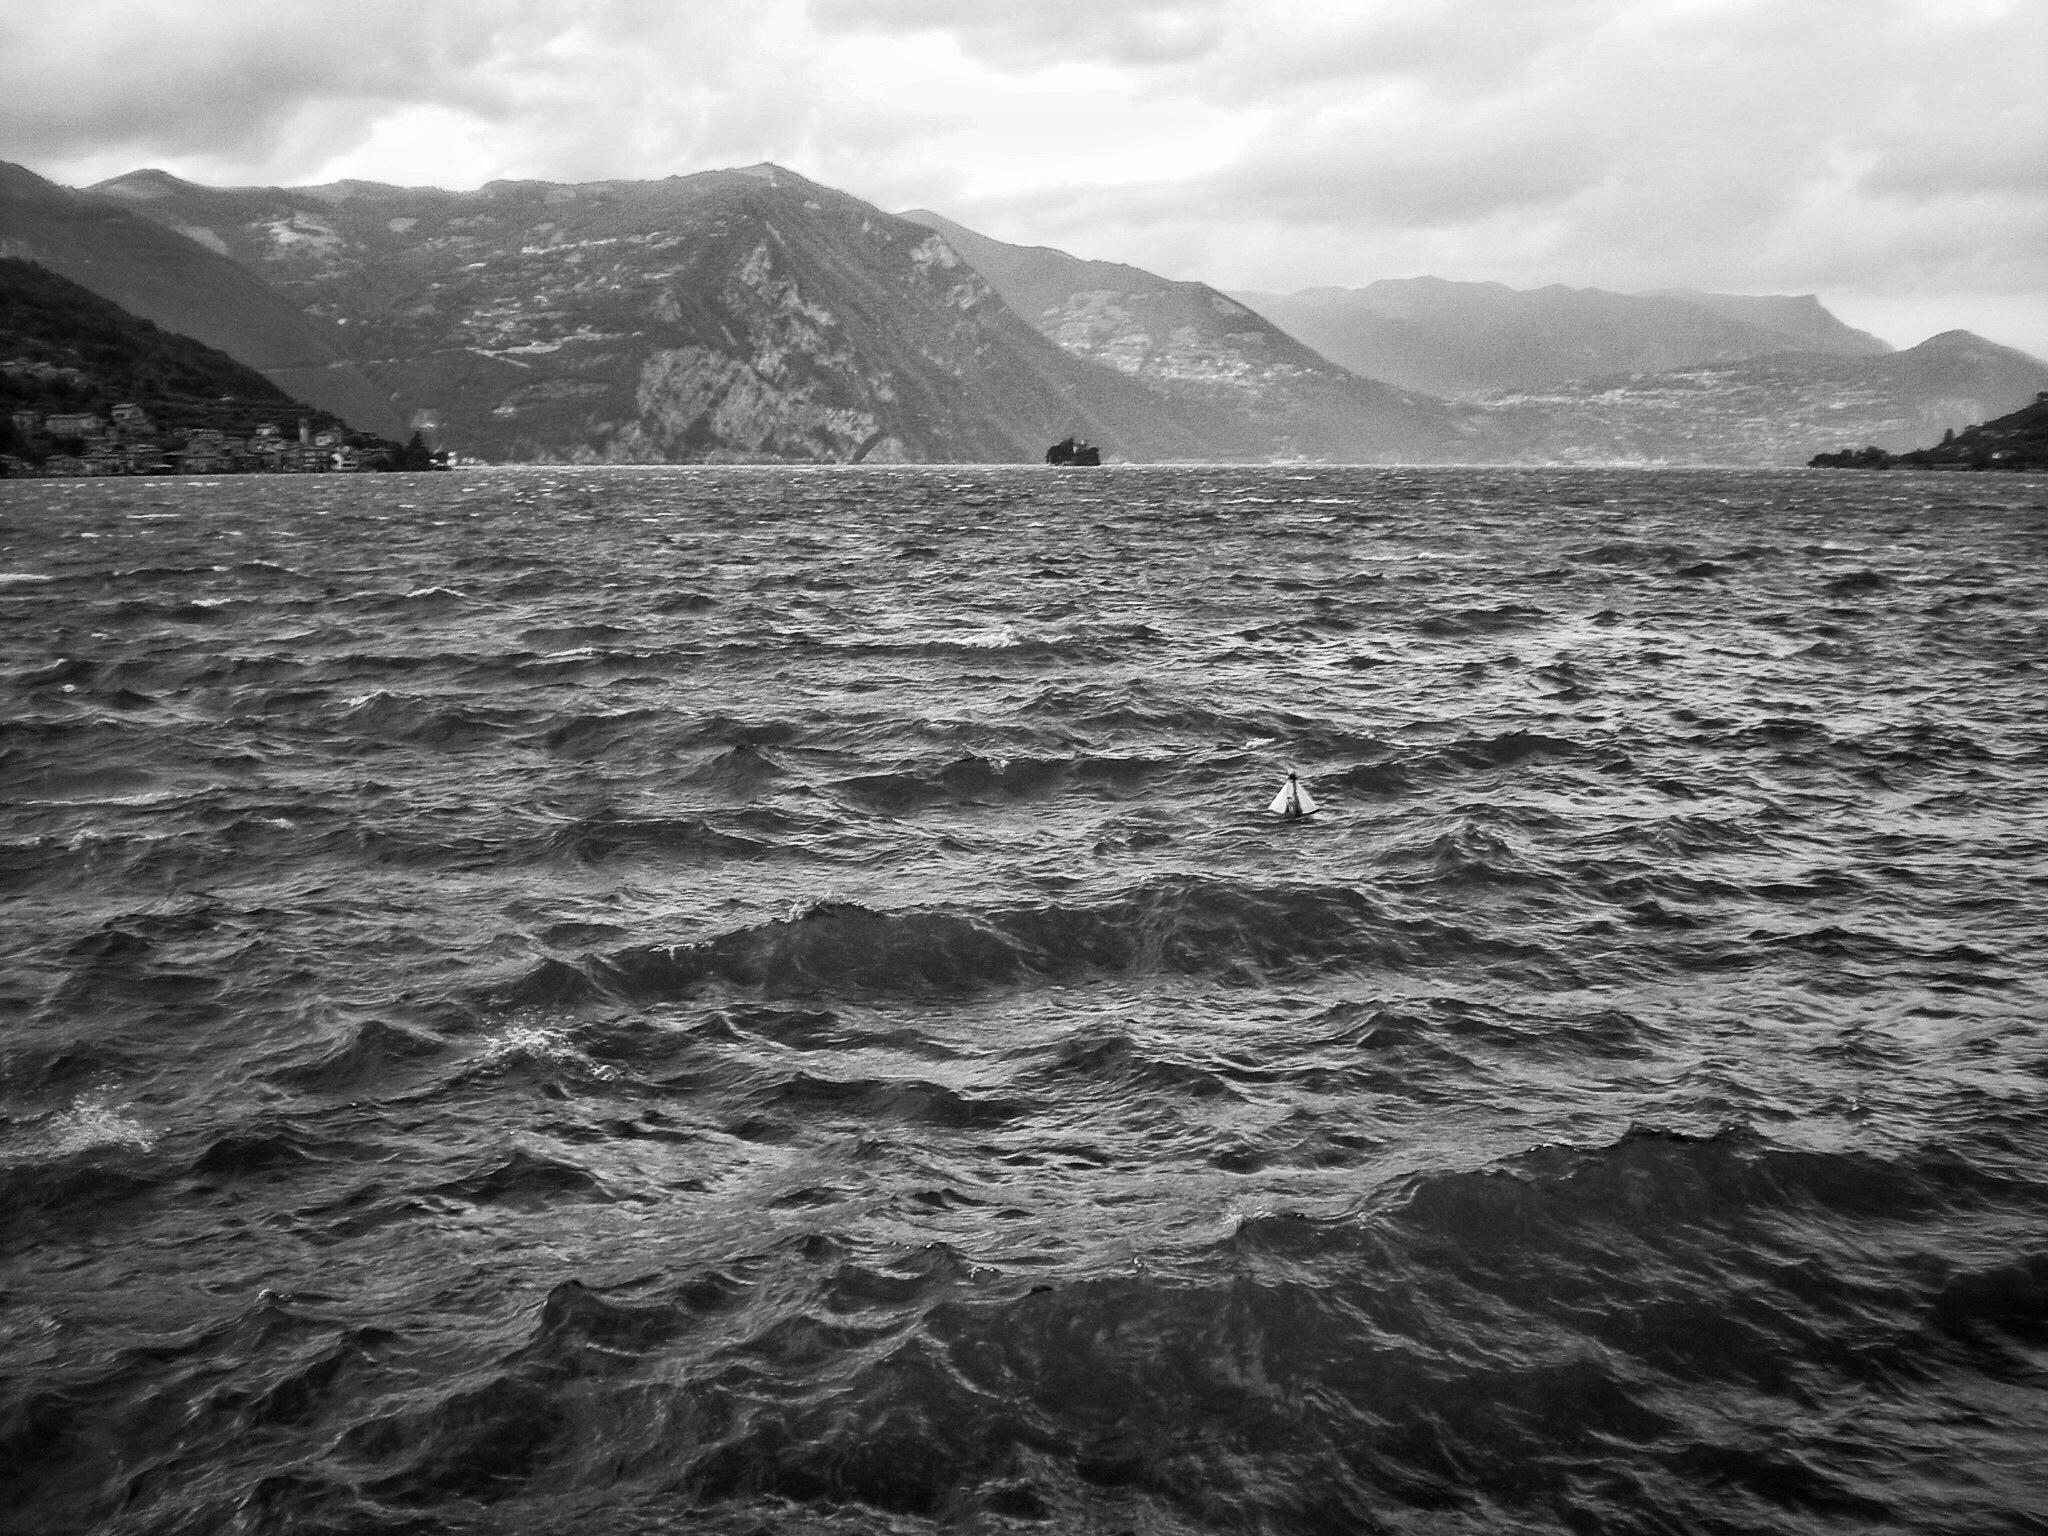 Iseo Lake, Italy (2008) by Federica O.